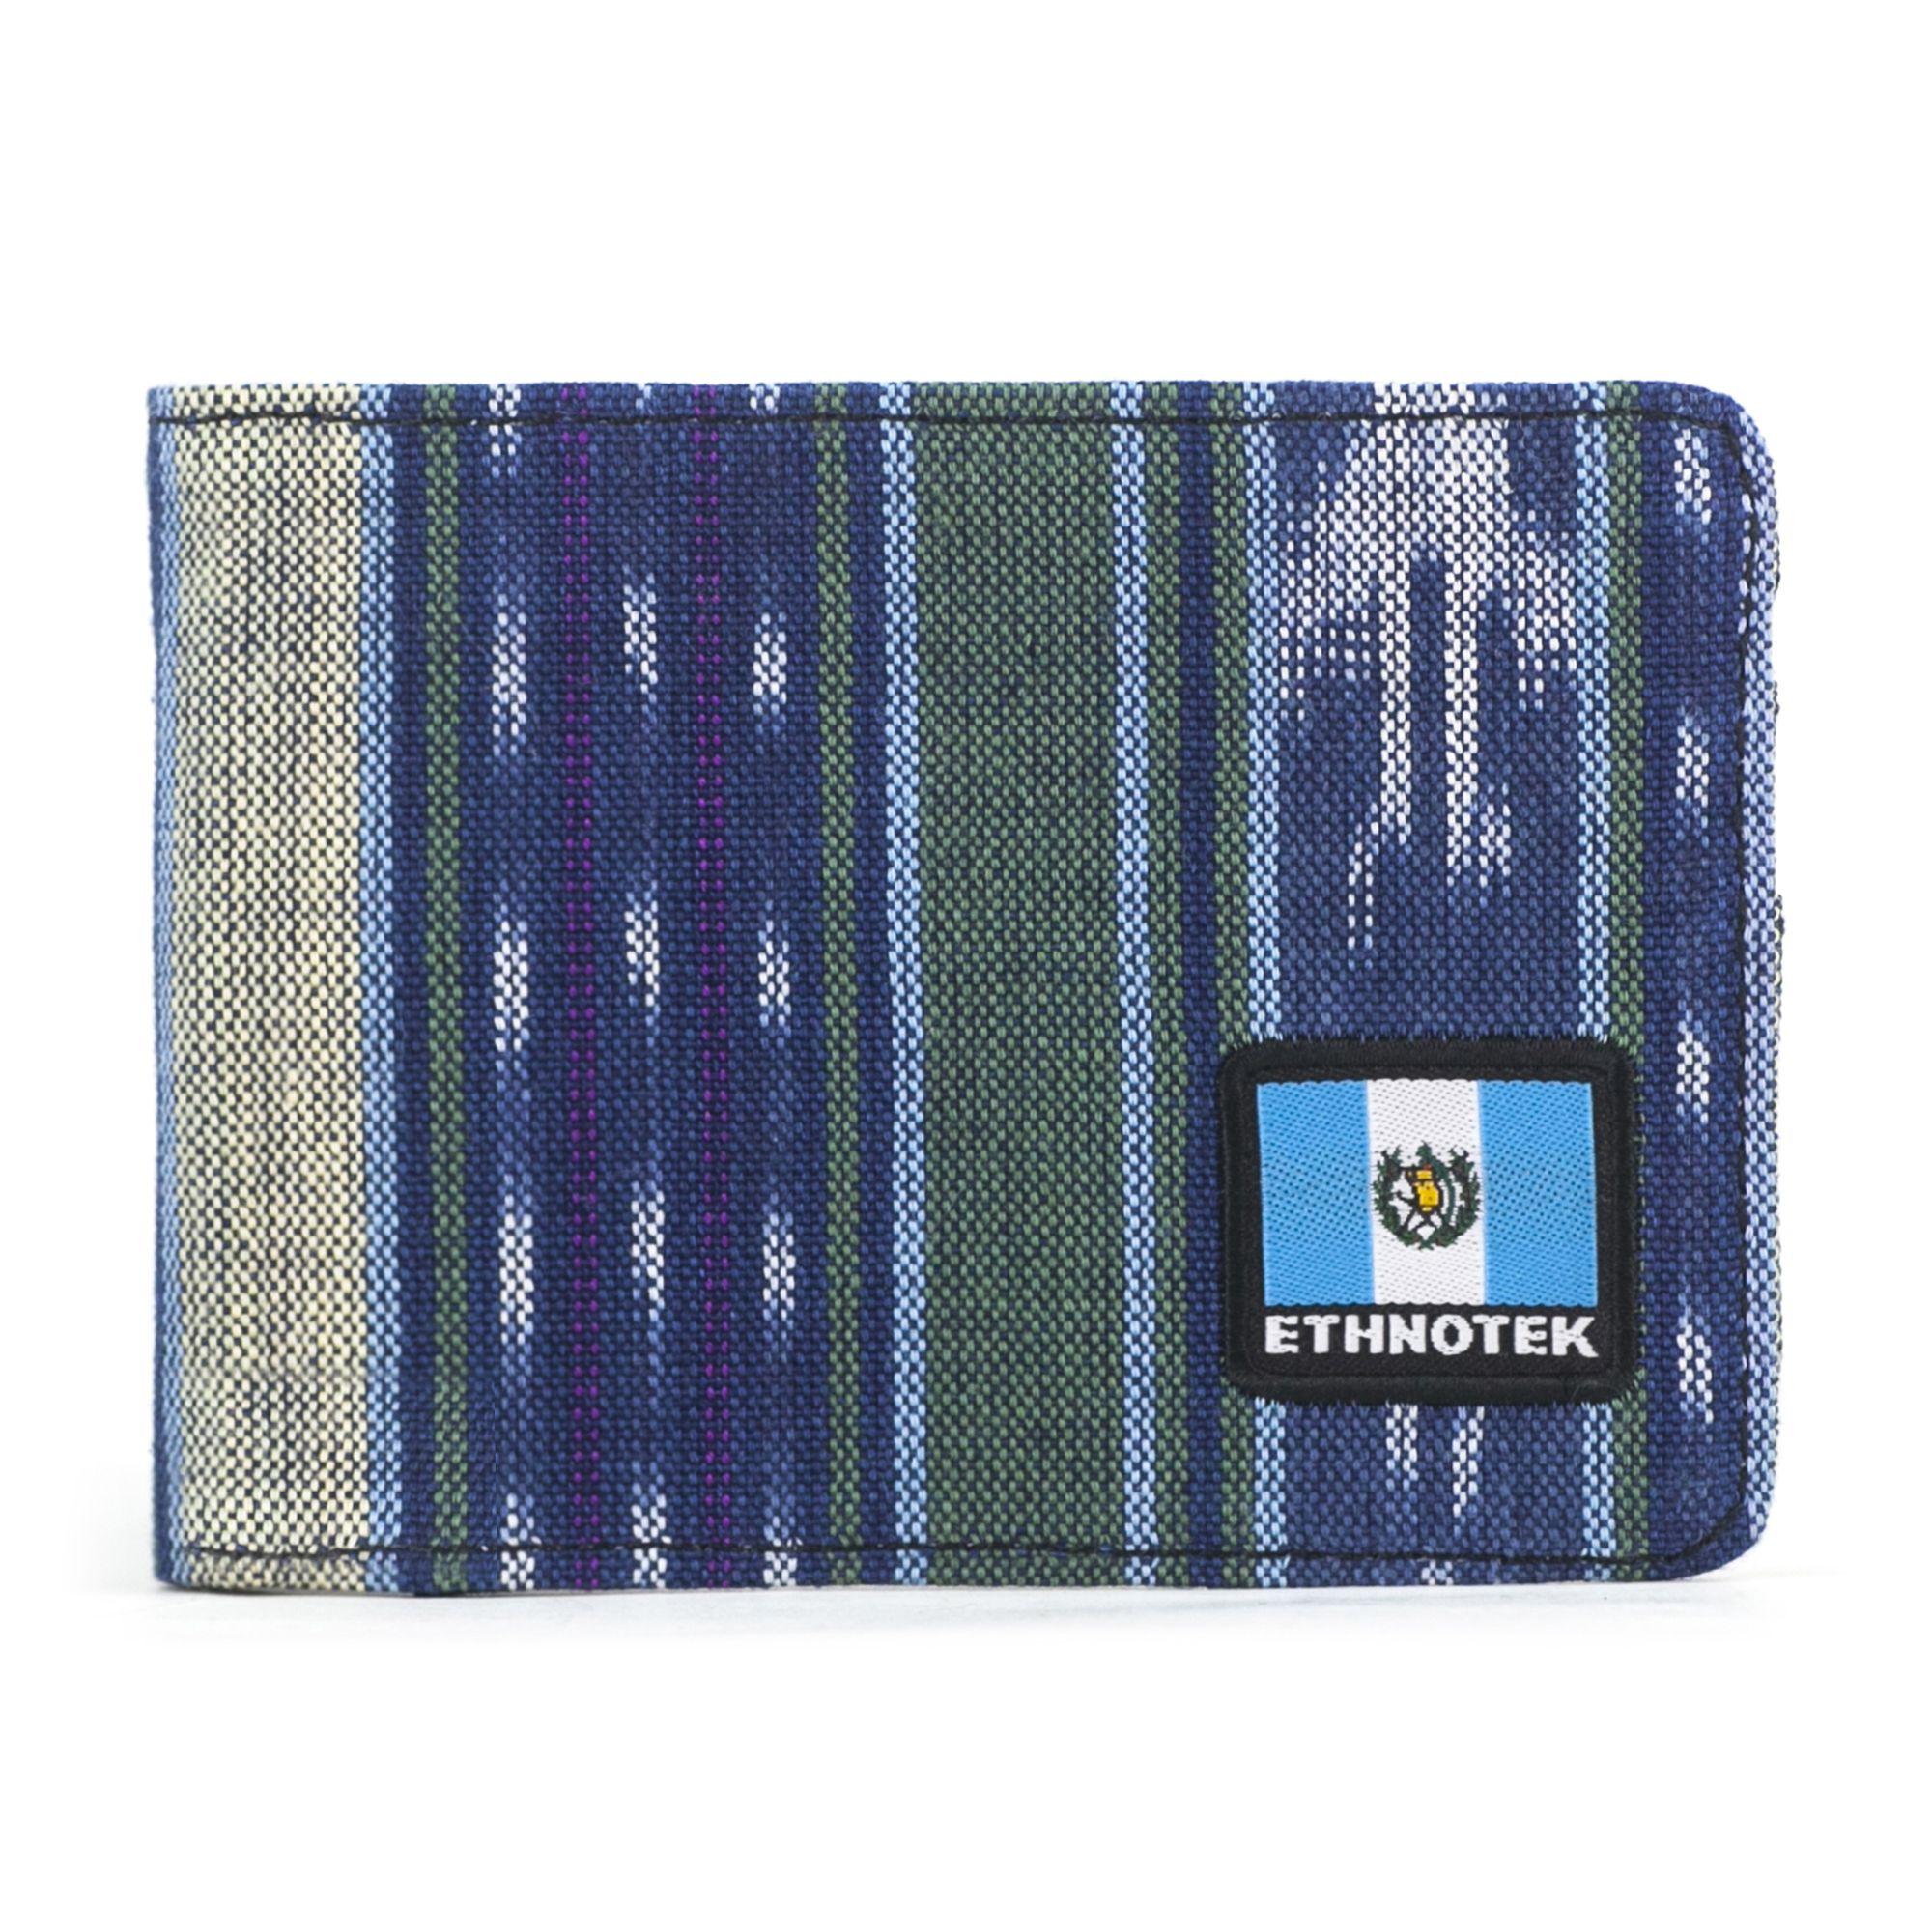 Ketat Slim Wallet Guatemala 9